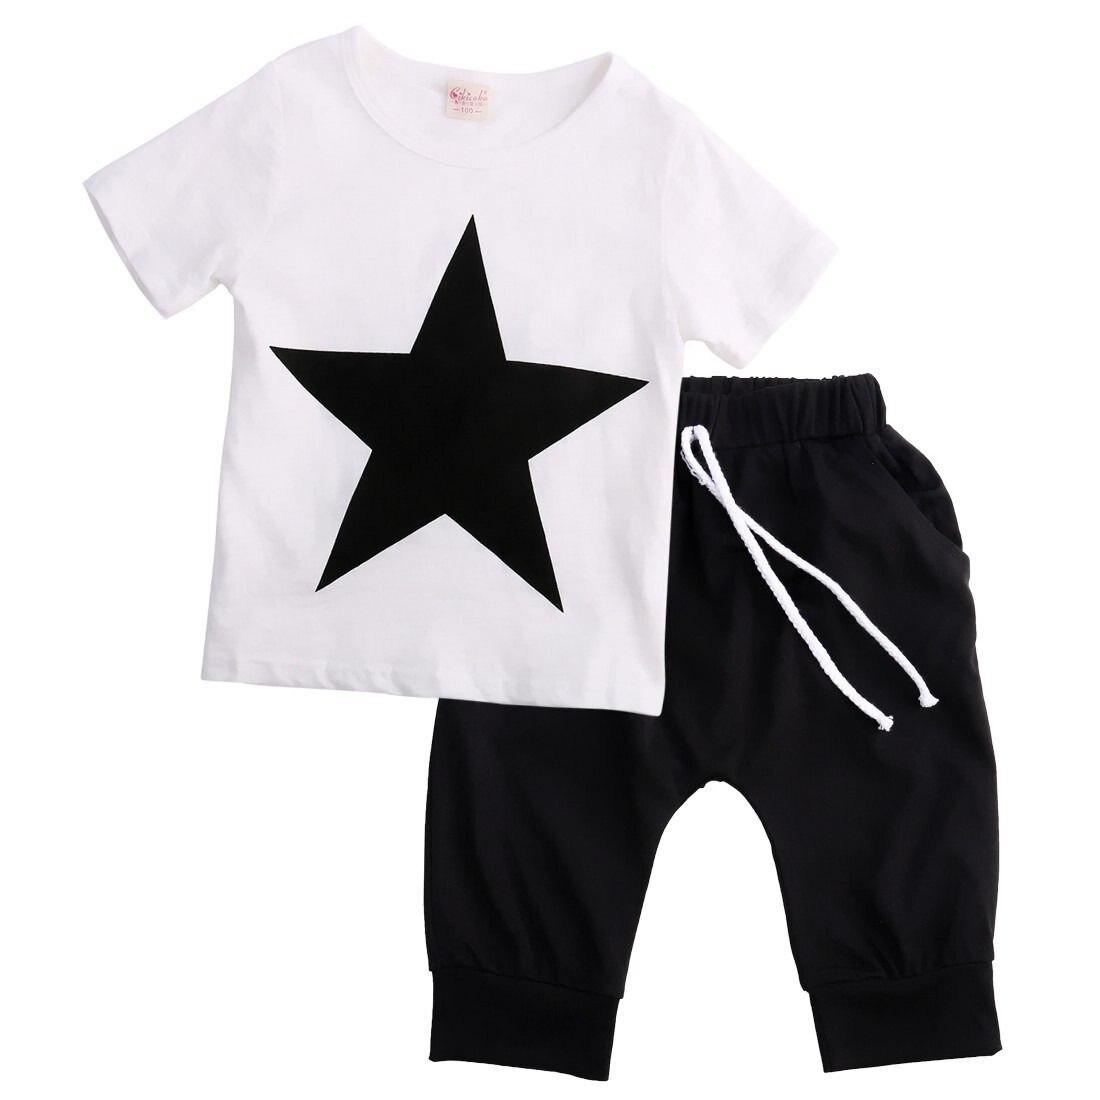 Helen115 Casual Kids Baby Boys Star Printed Short Sleeve T-shirt+Black Pants 2PCS Set 2-7Years